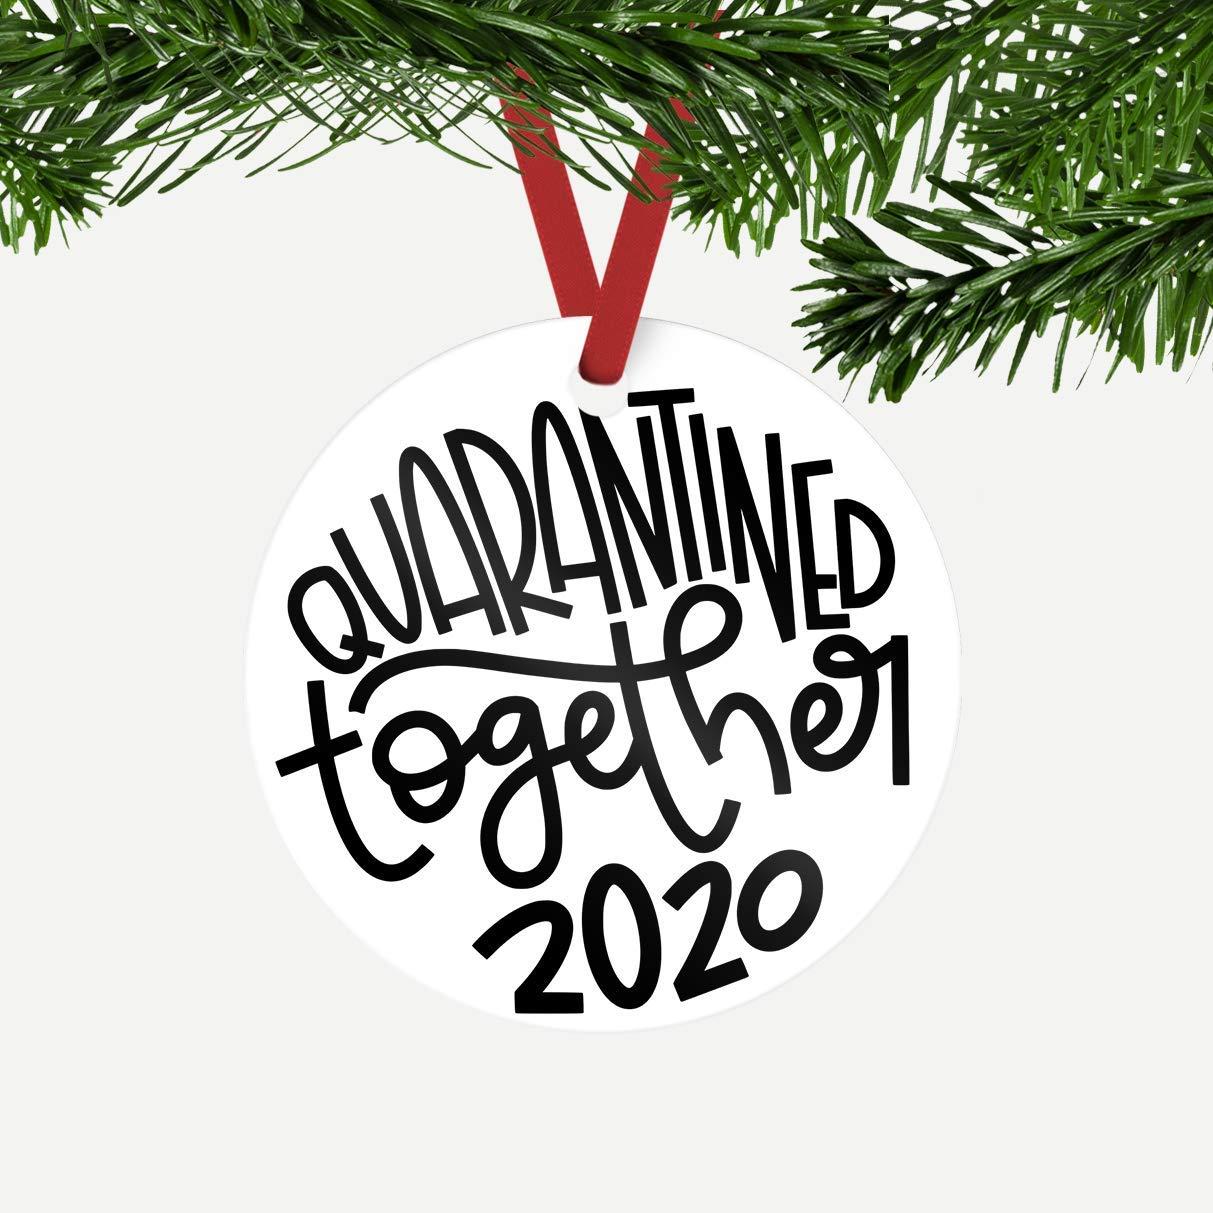 Quarantined Together 2020 Ornament